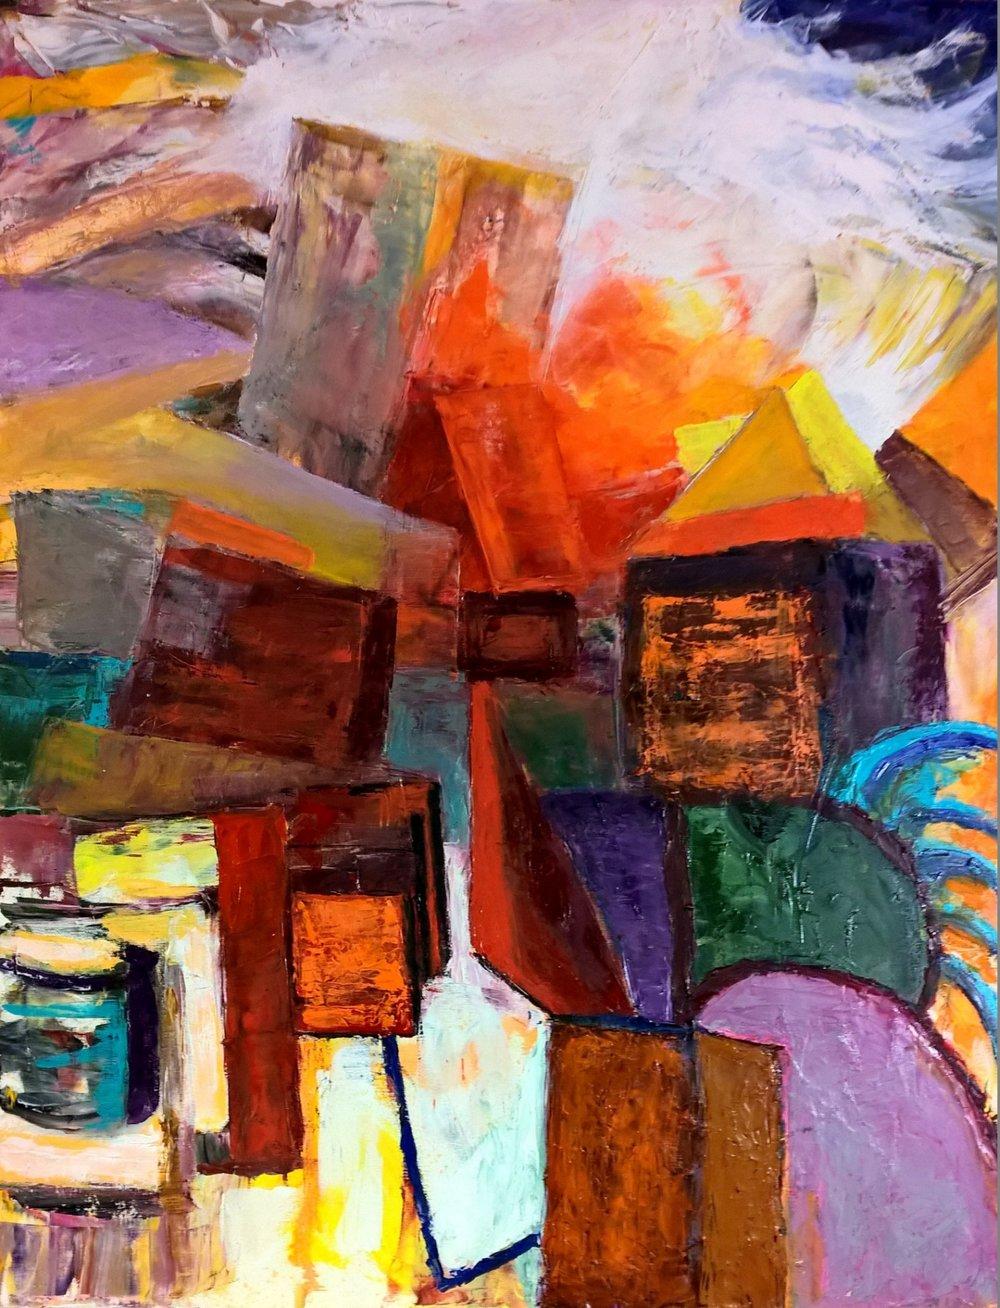 Nicolas Bouteneff Title: Beyond Size: 30 x 22 Price: $8000